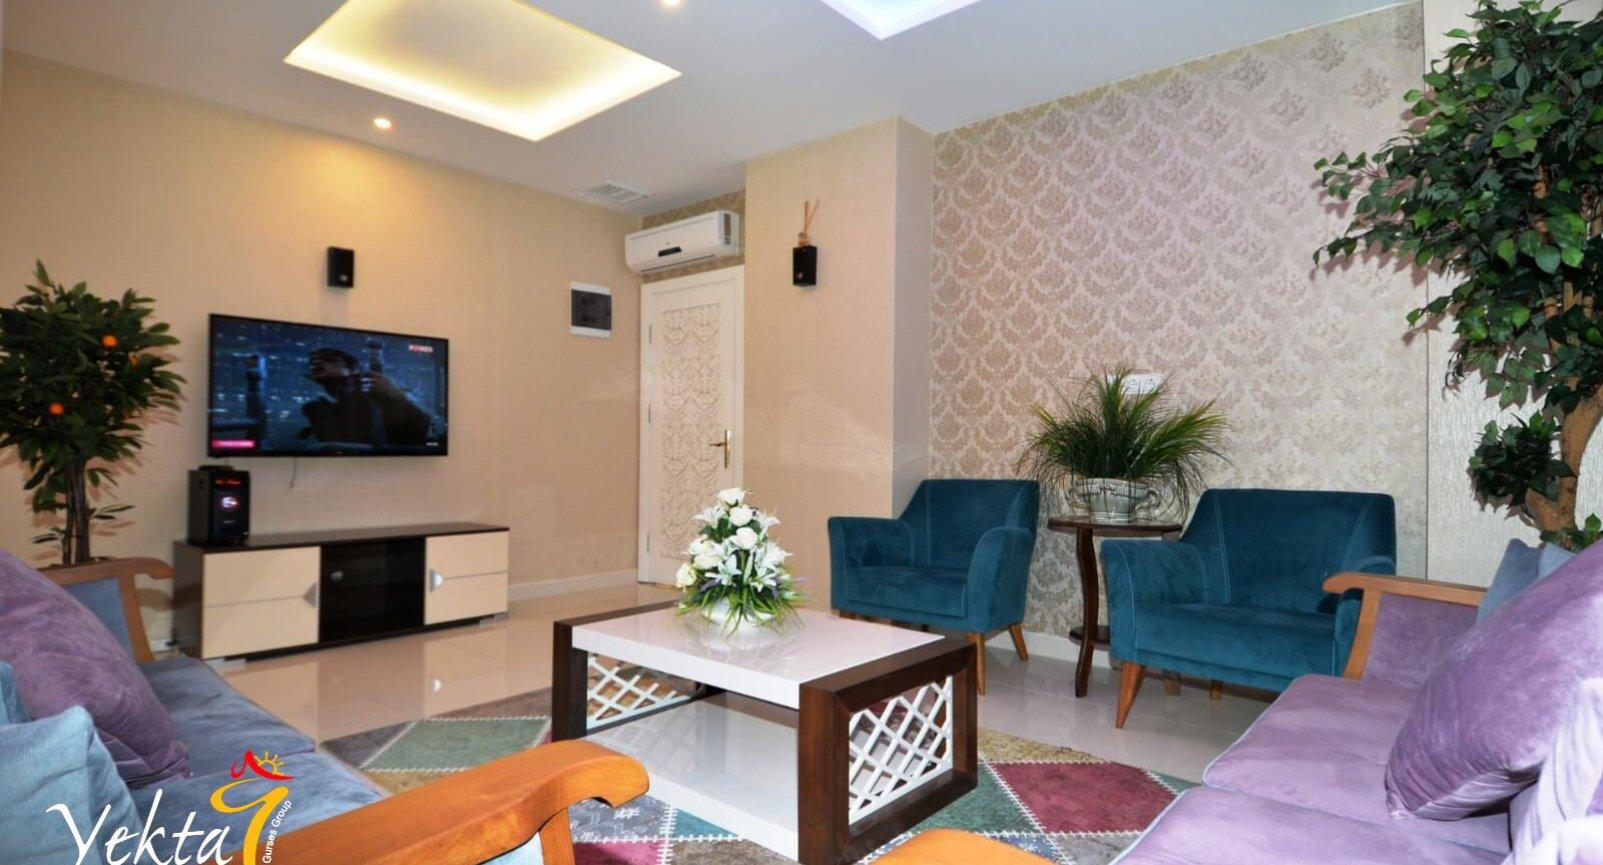 Роскошные апартаменты 2+1 в районе Махмутлар